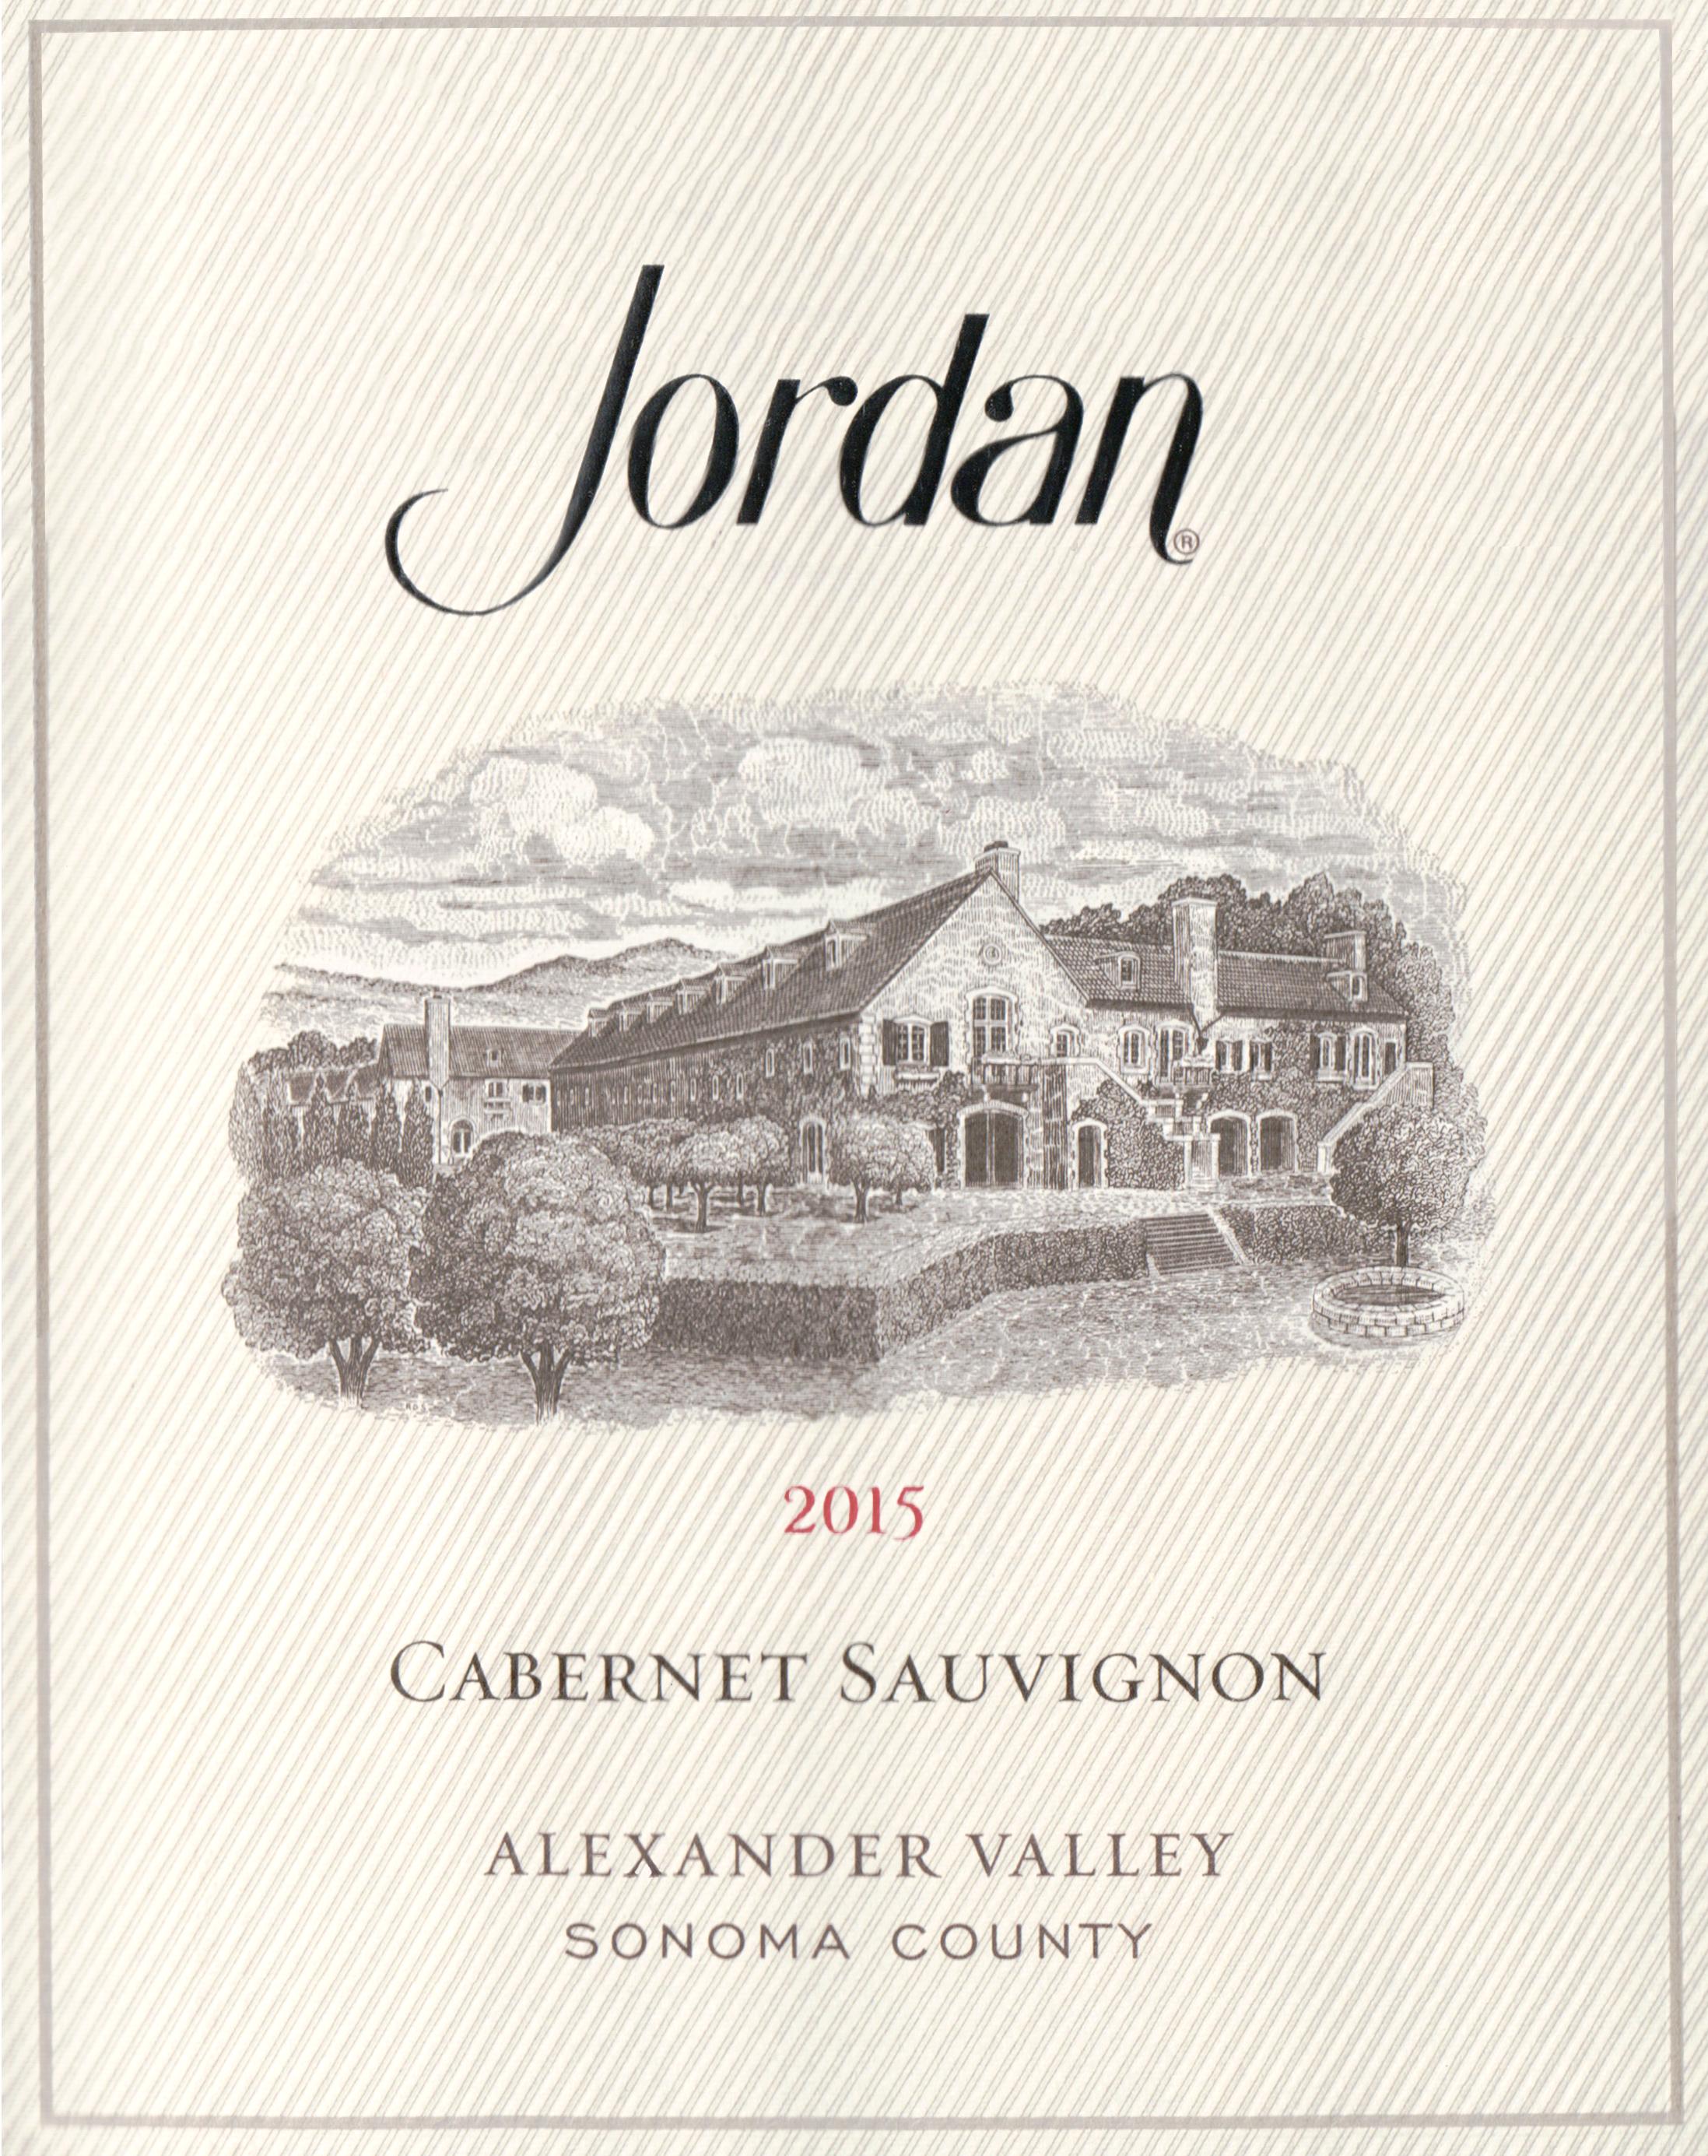 Jordan Cabernet Sauvignon 2015